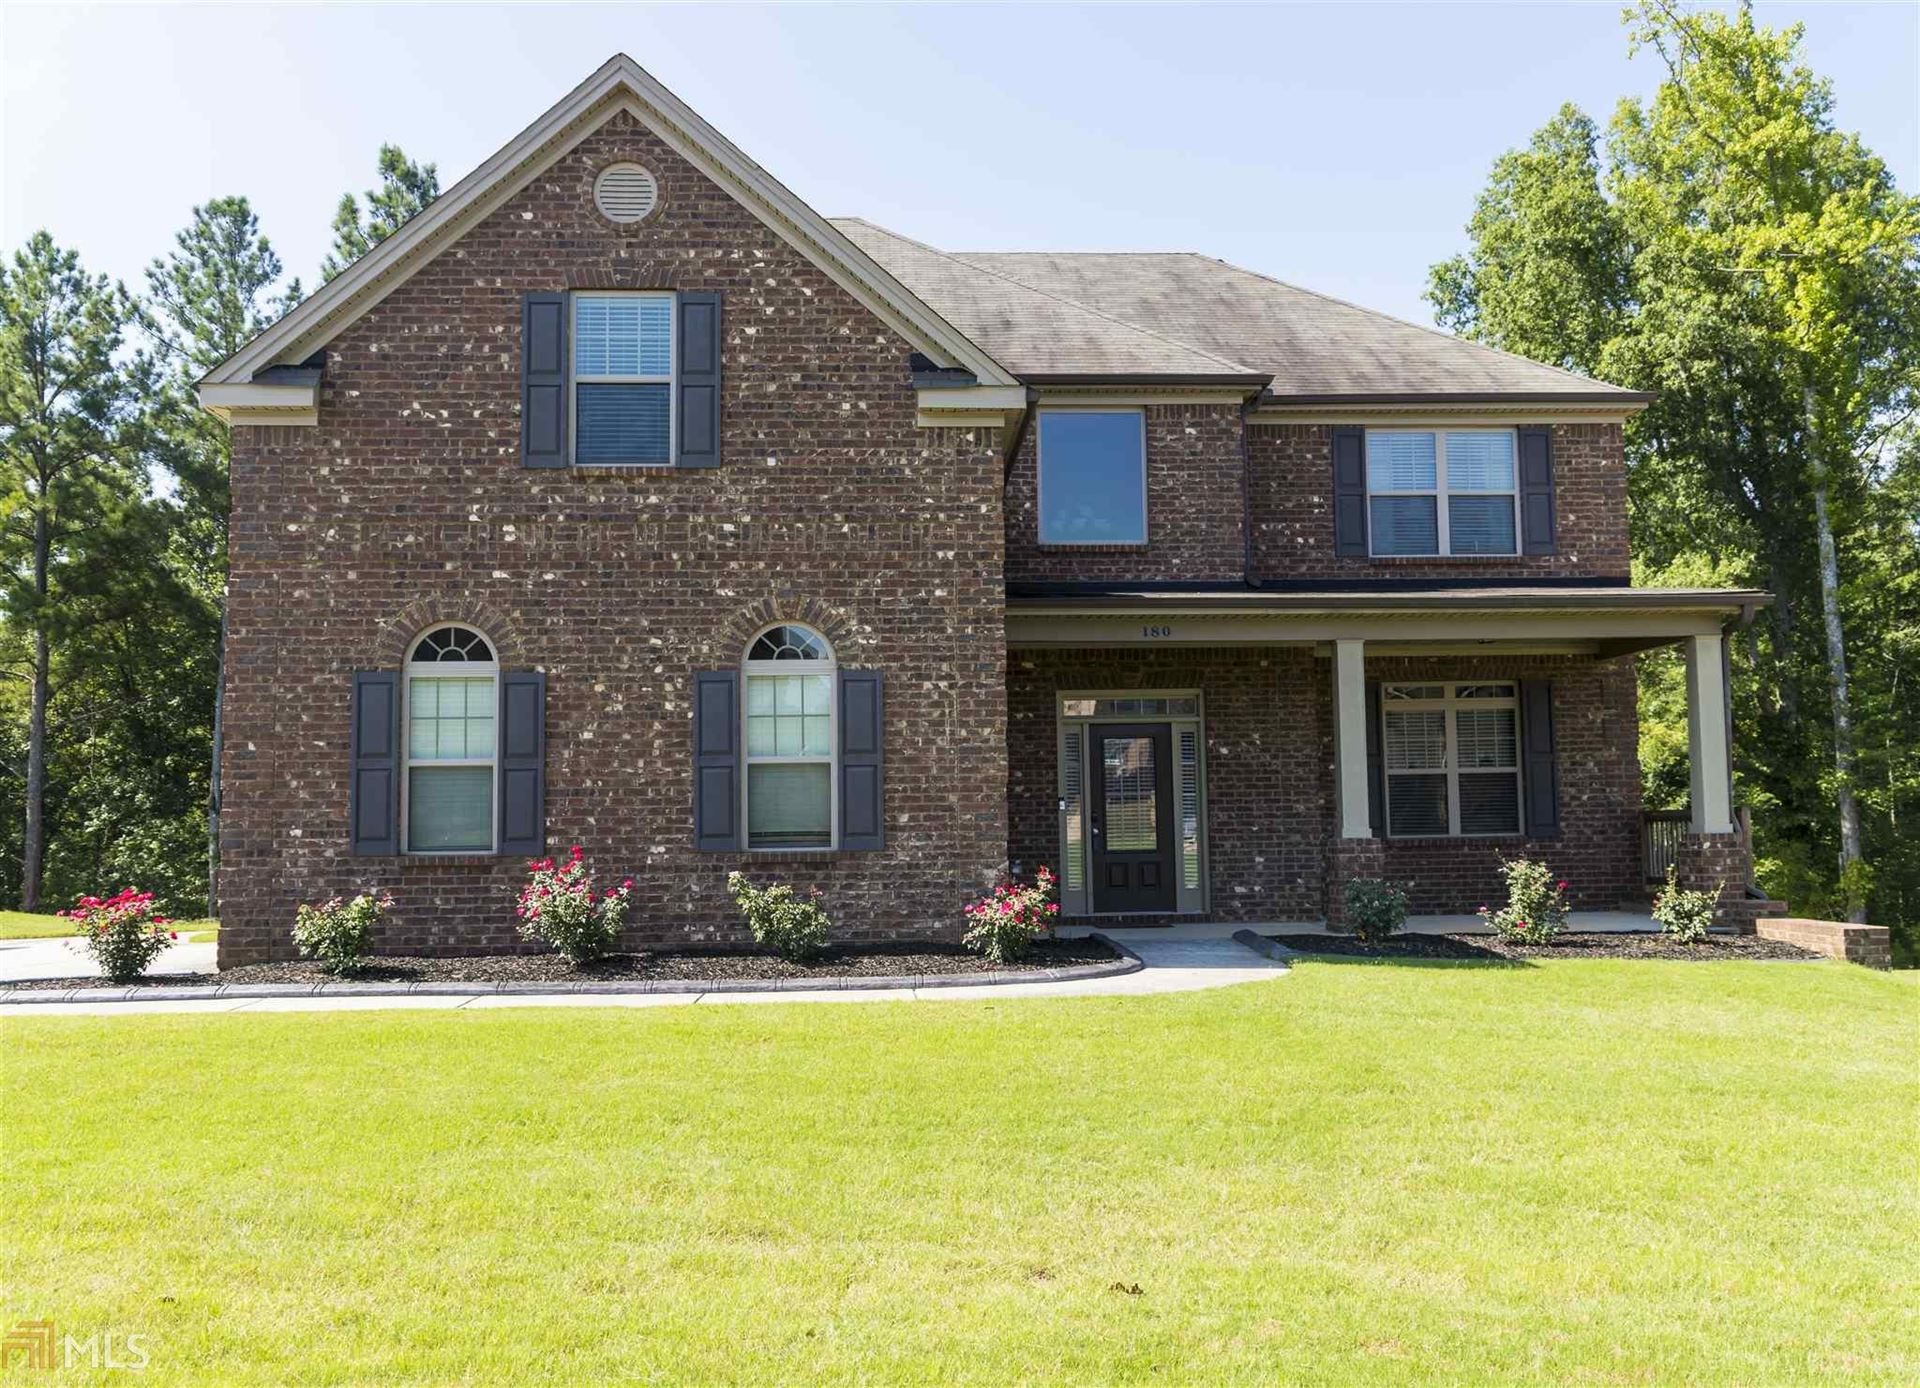 180 Waypoint, Stockbridge, GA 30281 - MLS#: 8814411